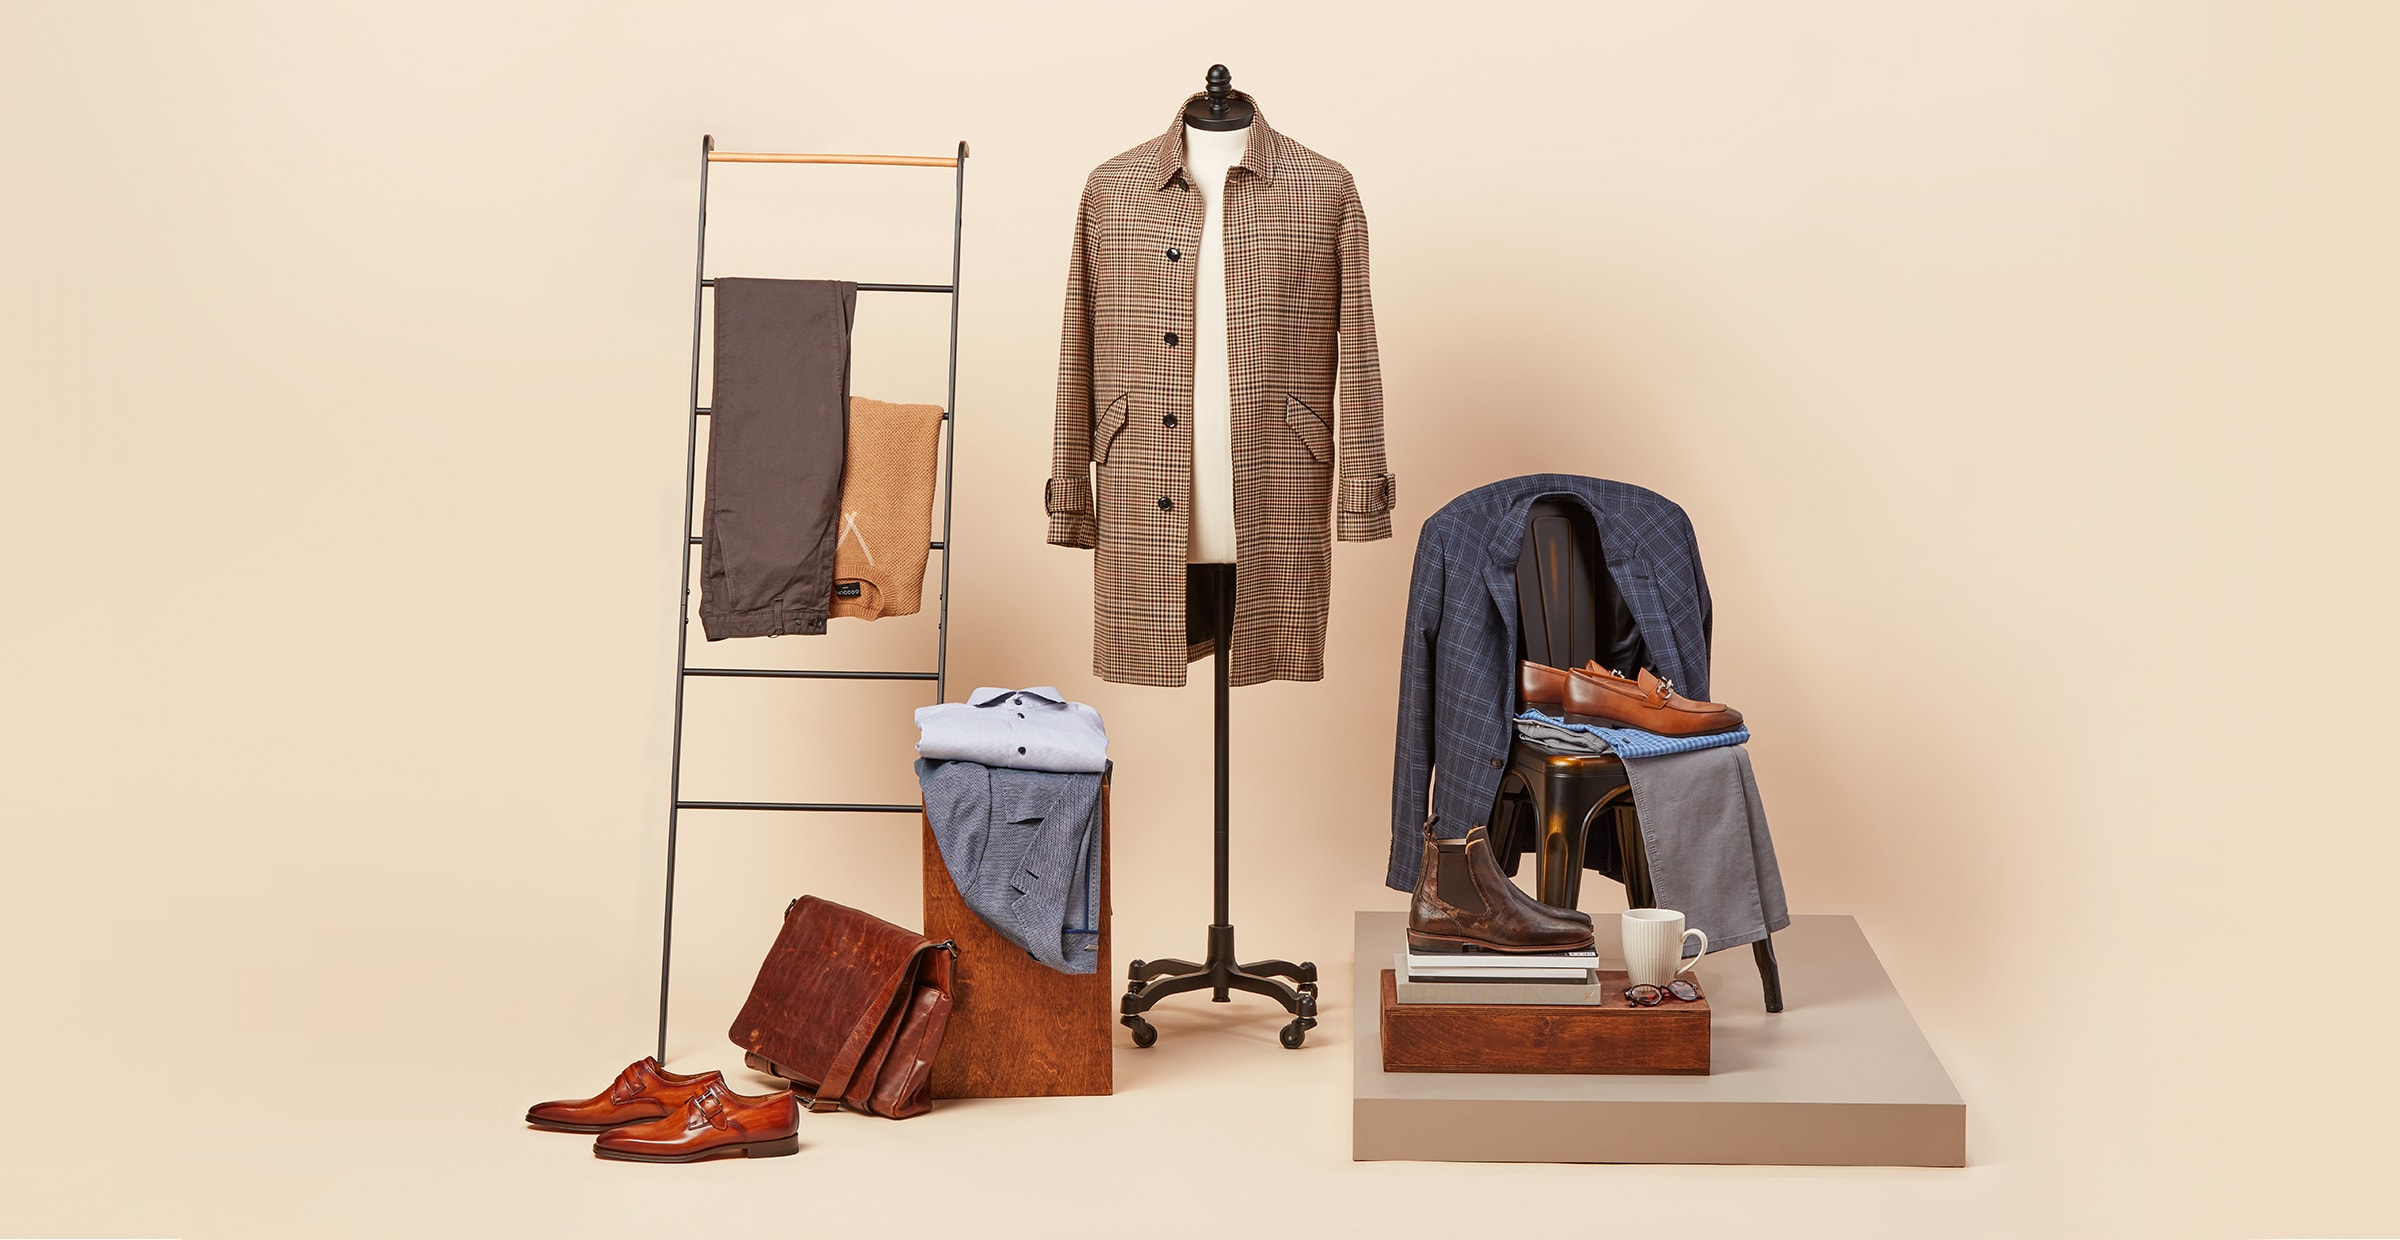 Winter workwear options